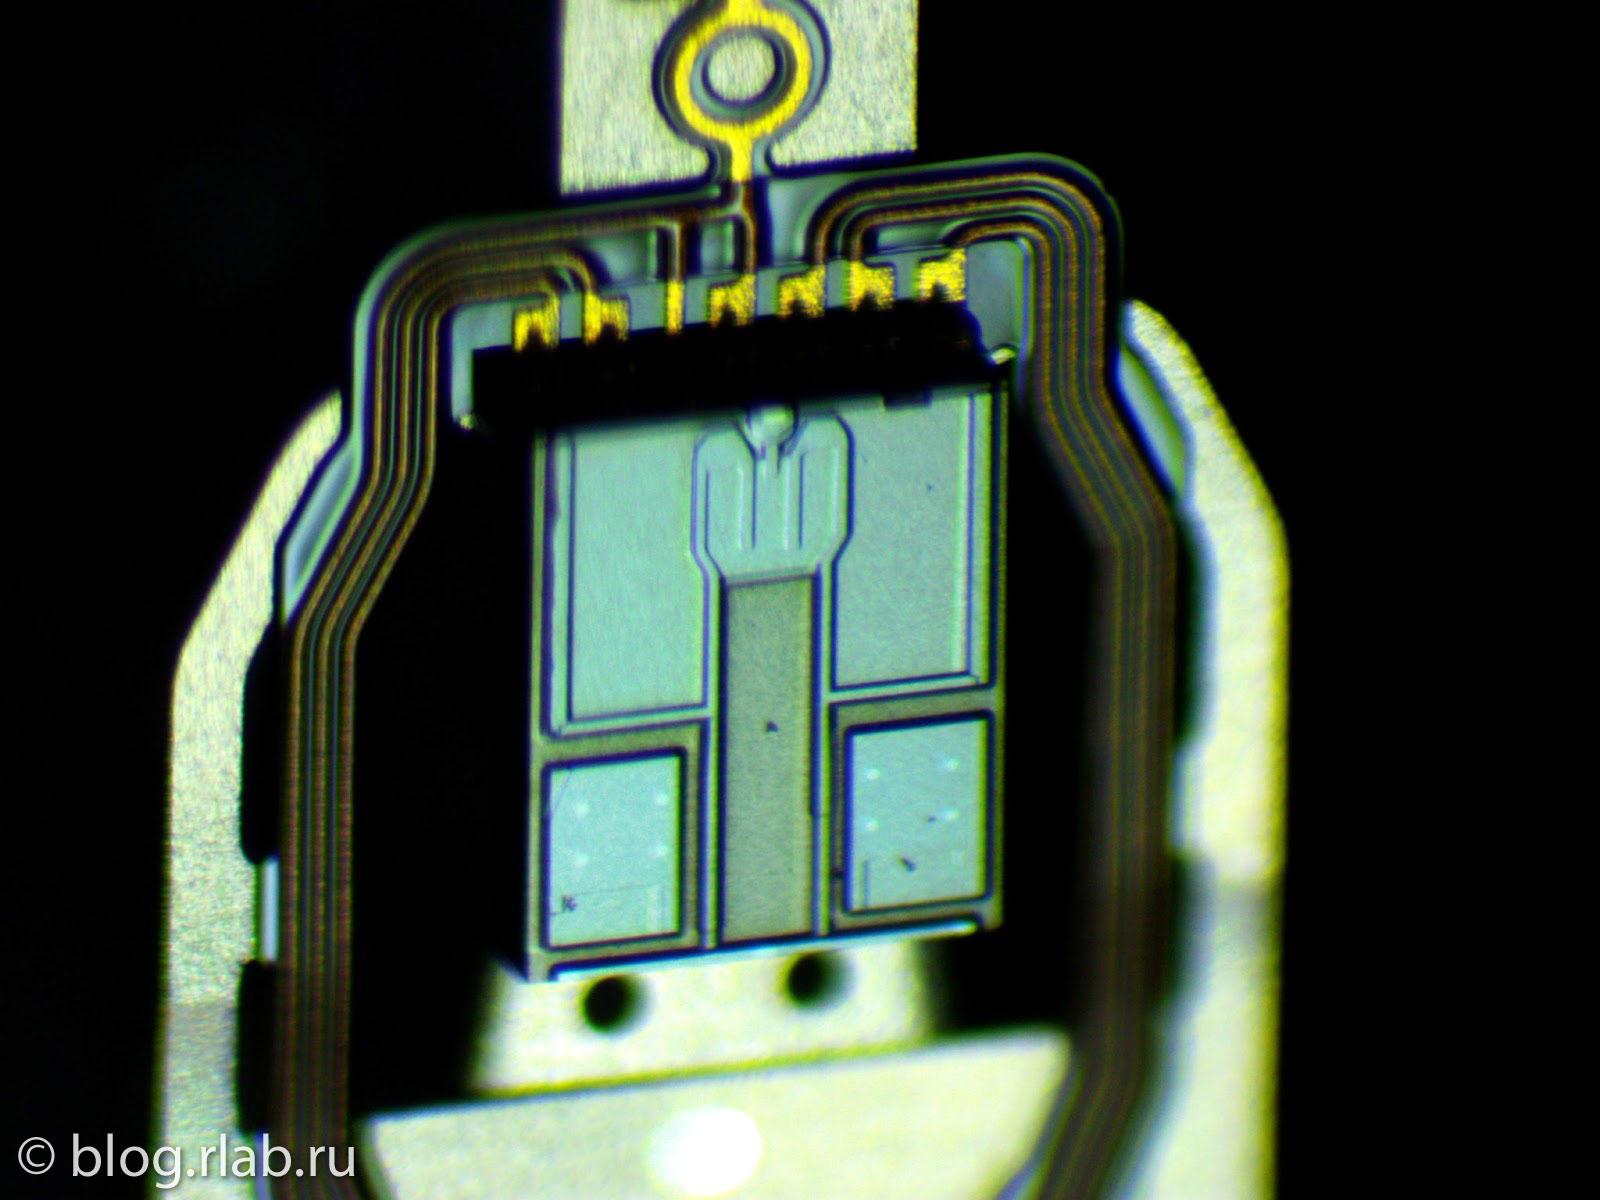 Фото головок жесткого диска Seagate, микроскоп